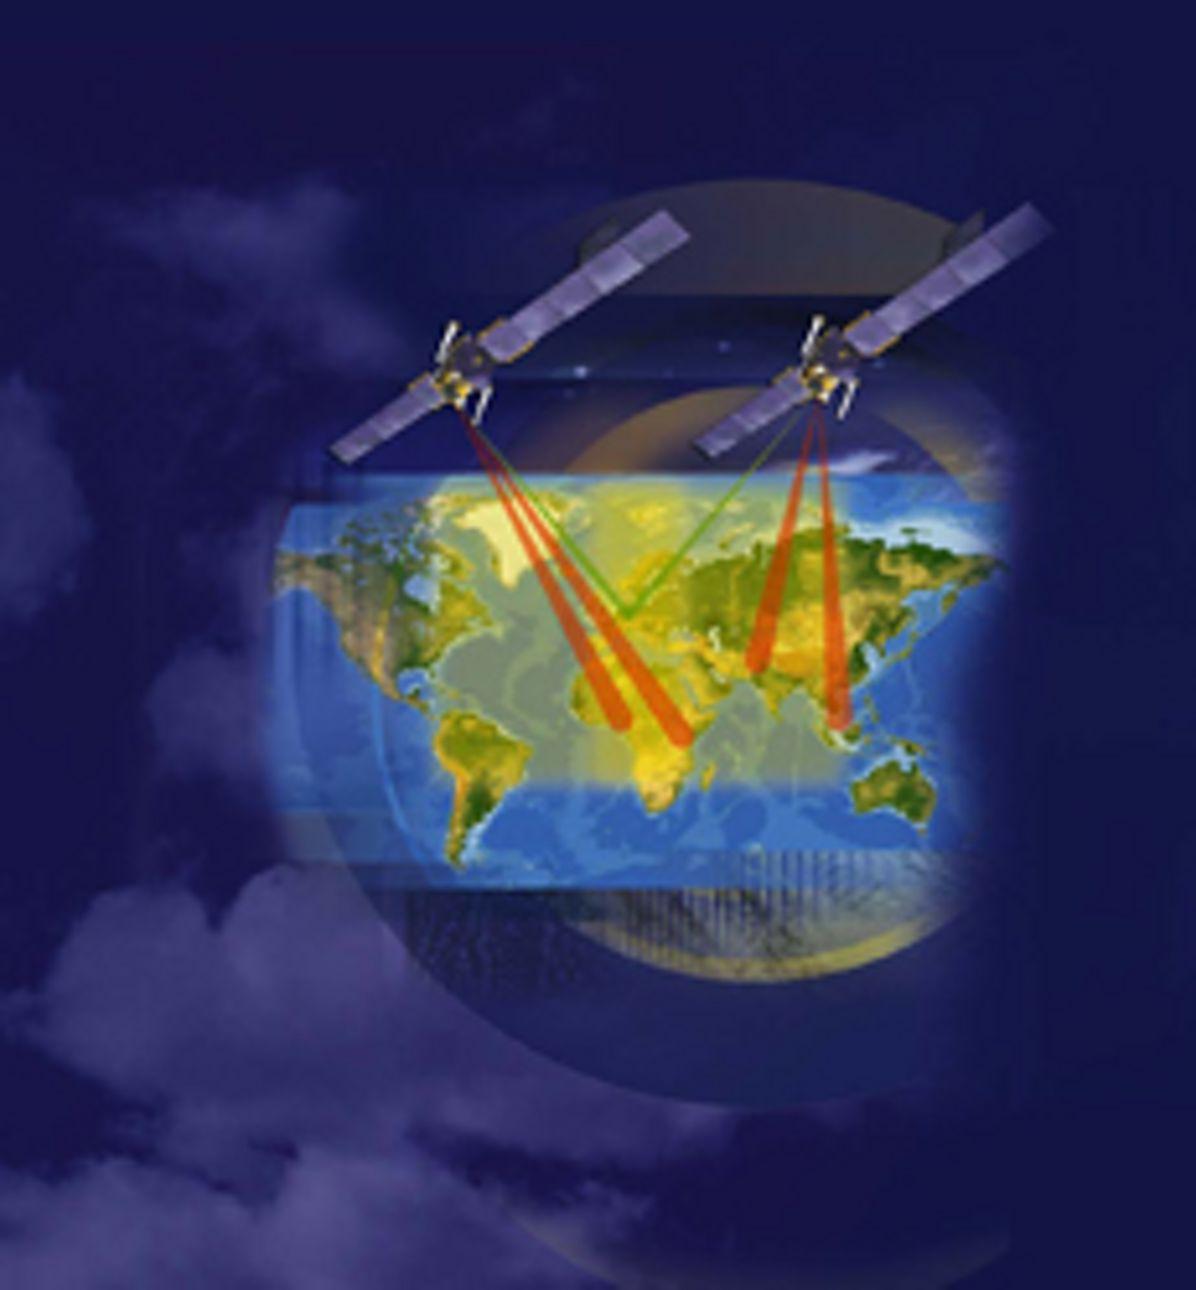 SatcomBW satellites